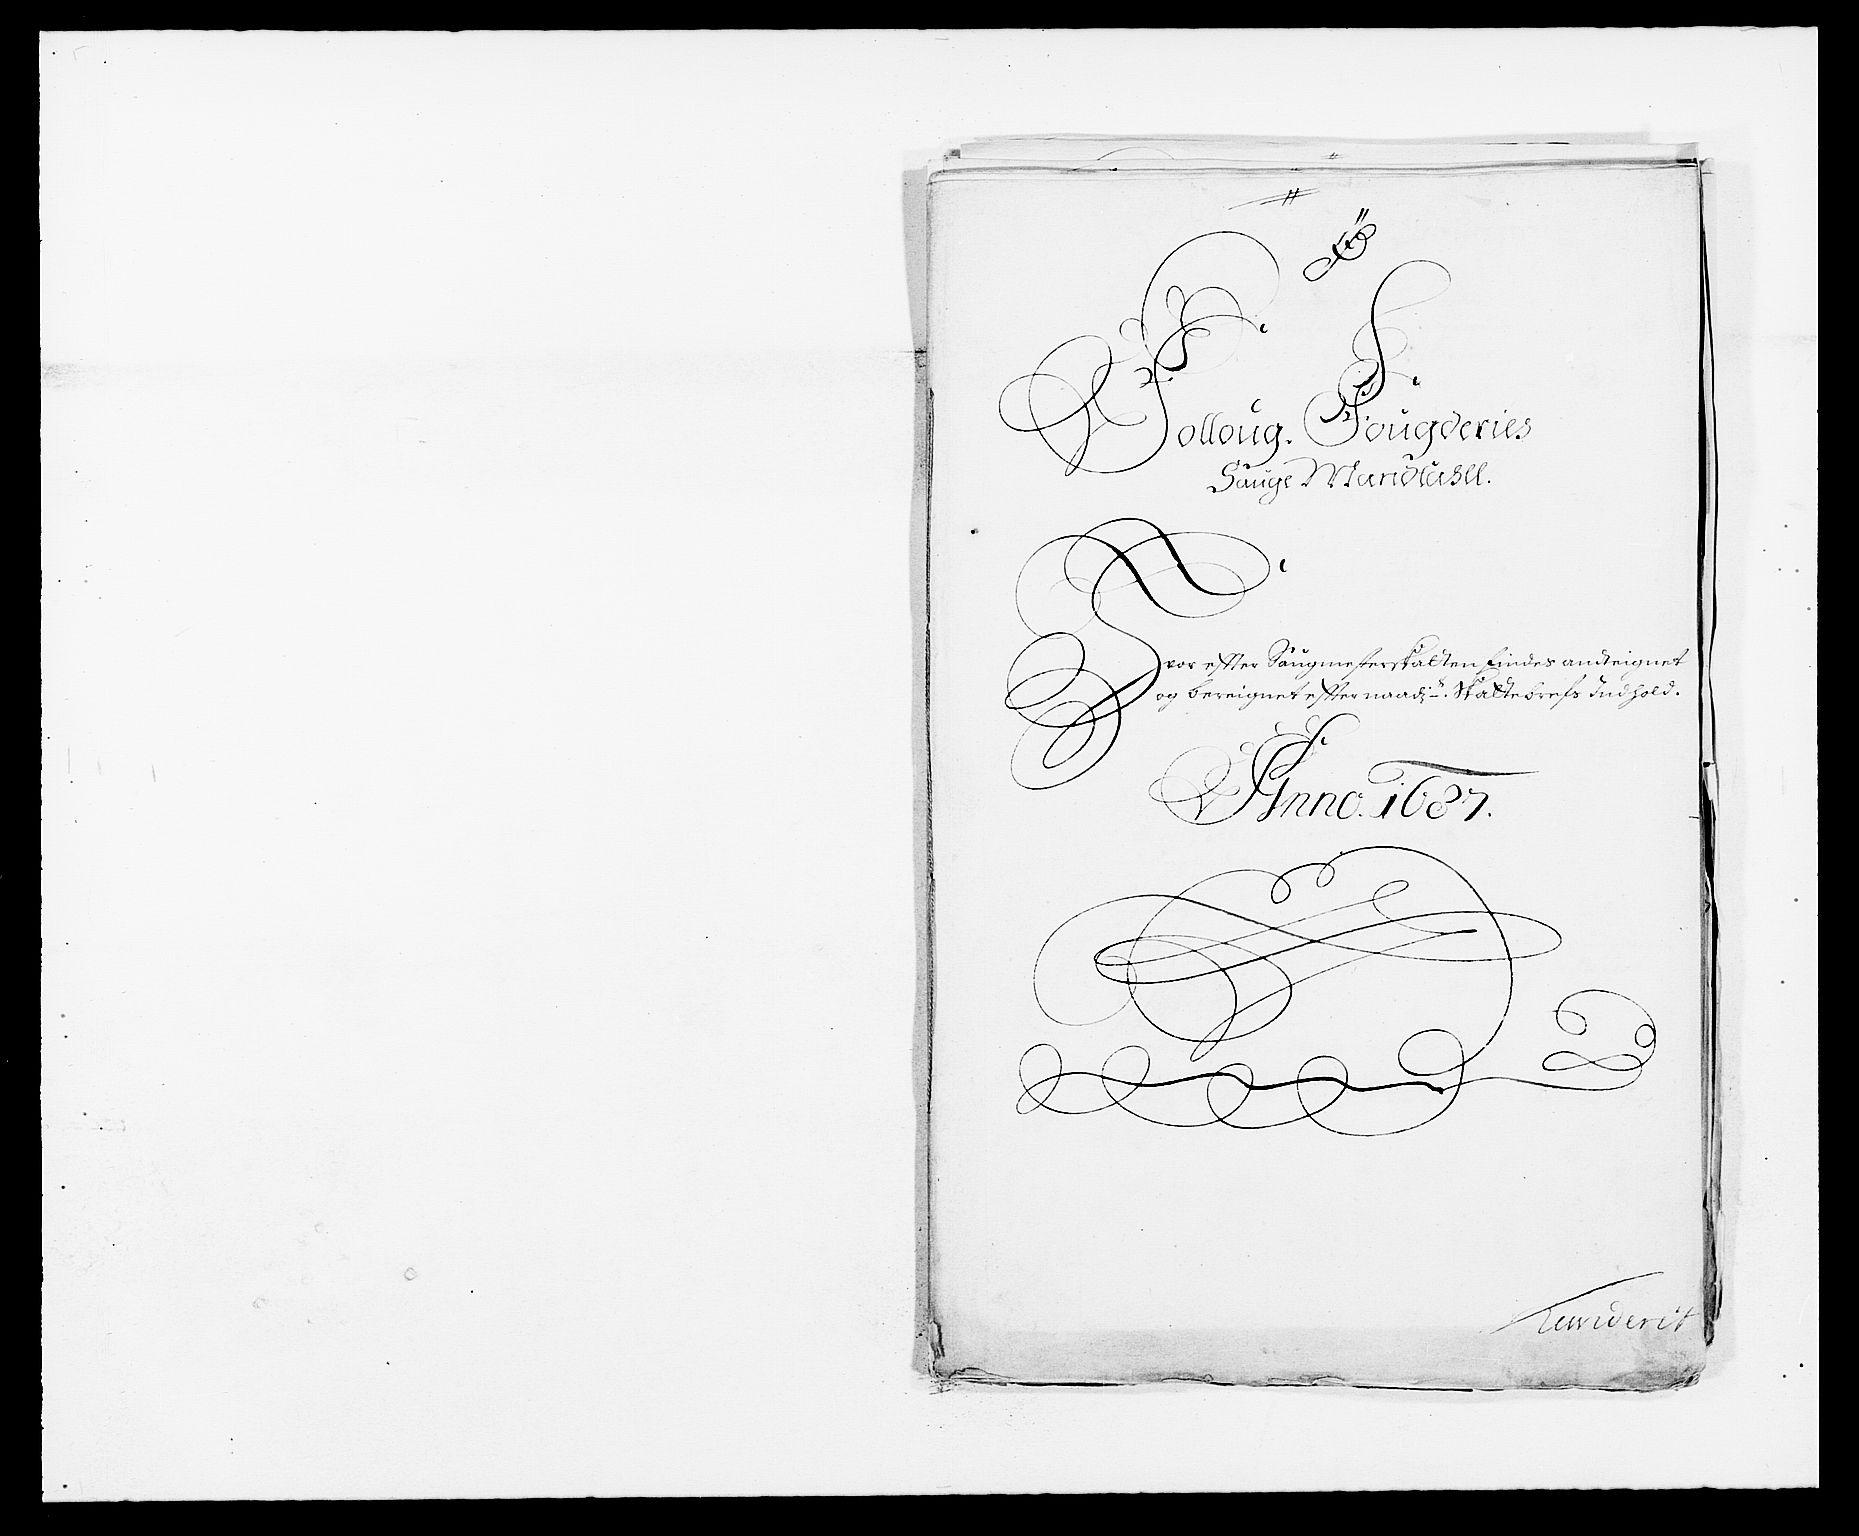 RA, Rentekammeret inntil 1814, Reviderte regnskaper, Fogderegnskap, R09/L0434: Fogderegnskap Follo, 1687-1688, s. 156